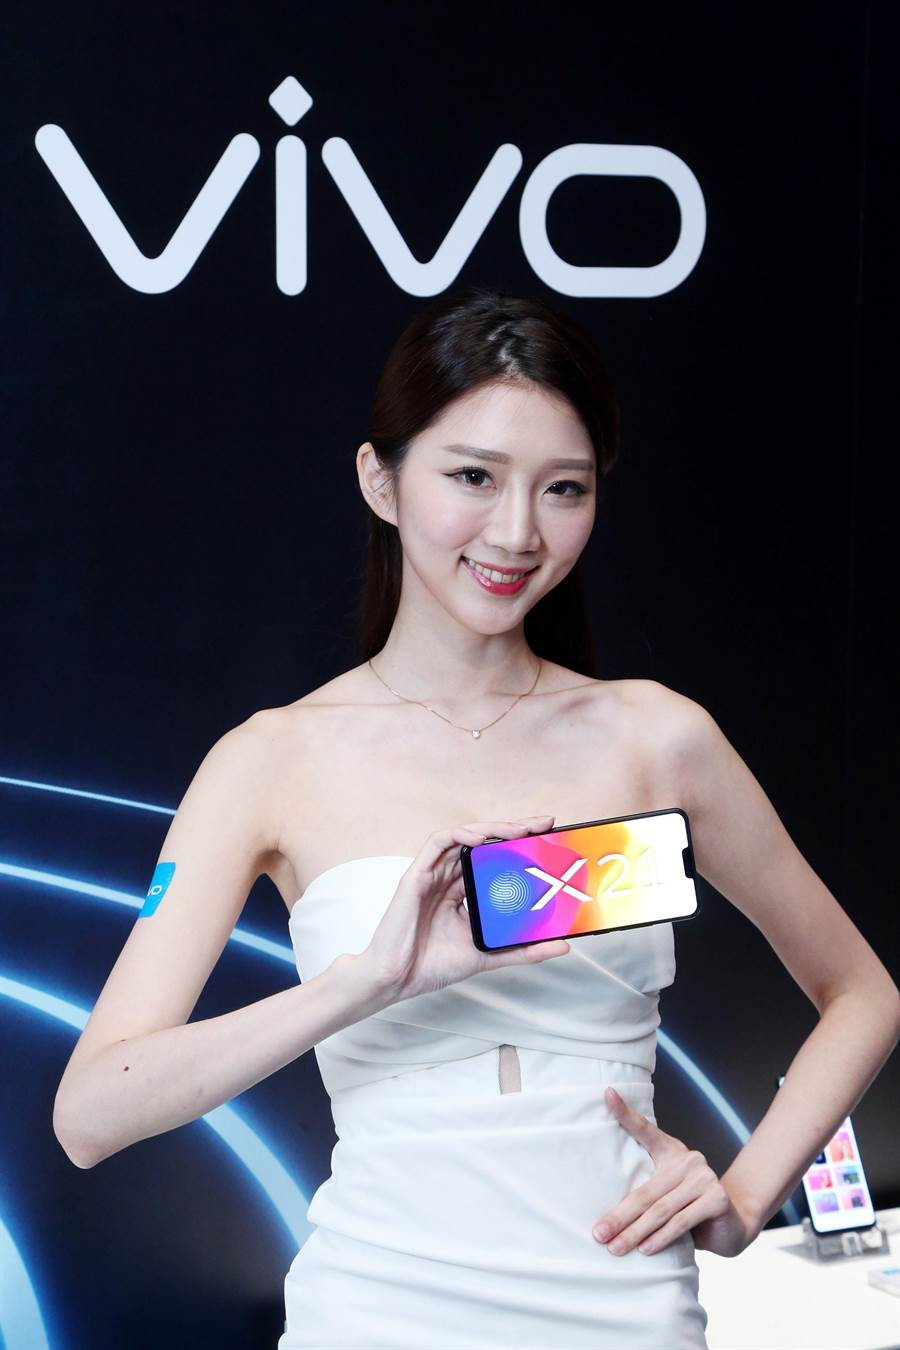 vivo新一代旗艦機「隱形指紋手機X21」正式登台,4日起於中華電信、台灣大哥大全省直營暨特約門市及加盟經銷商通路全面開賣,1萬6990元。